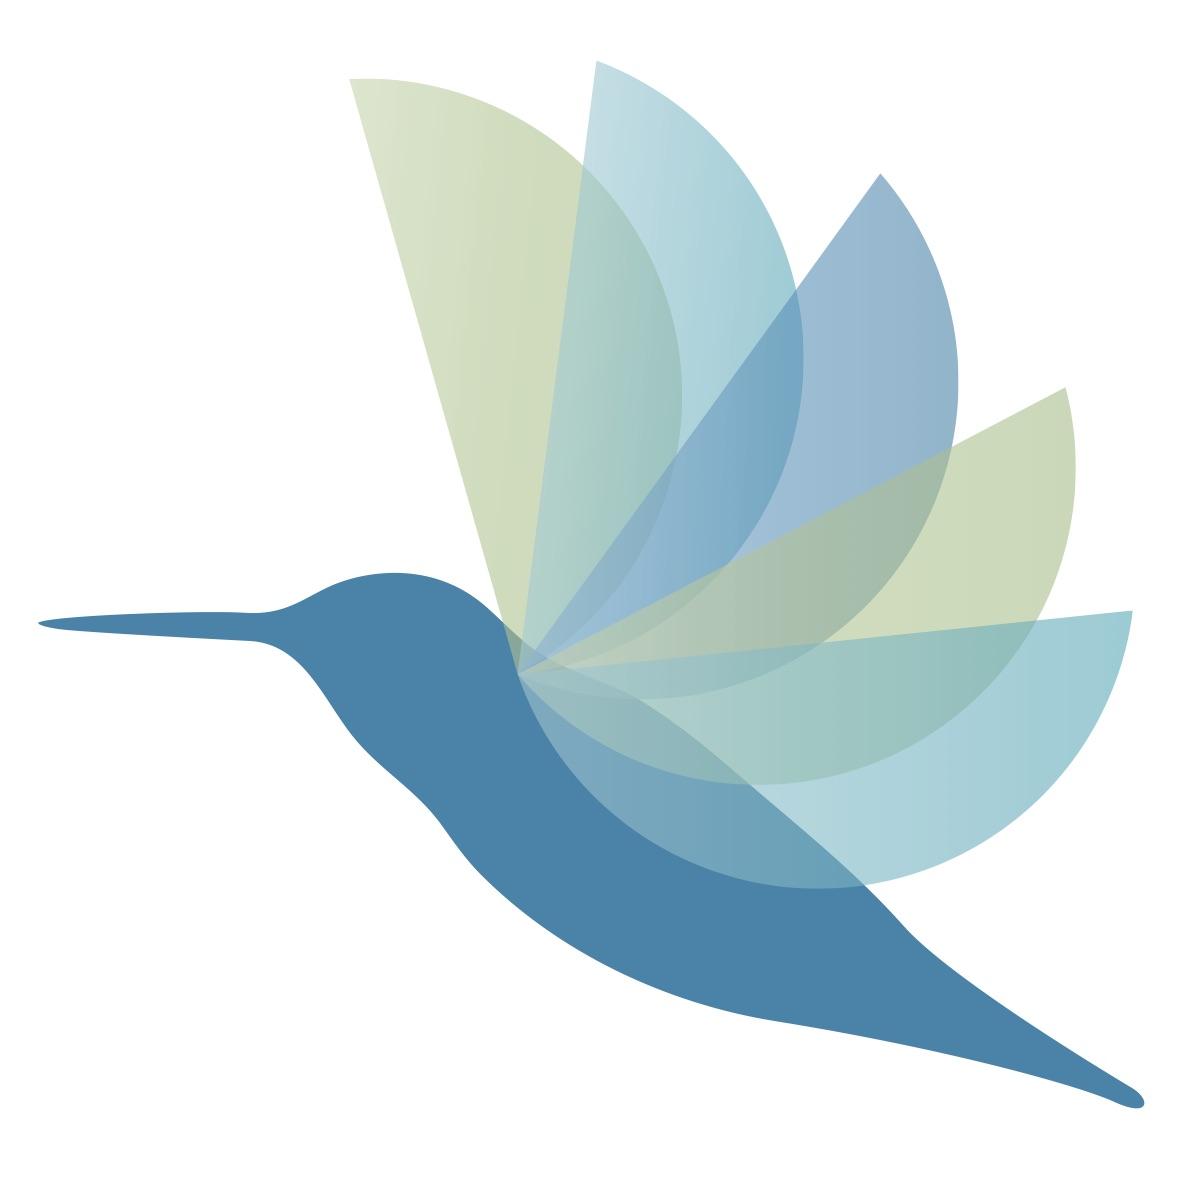 CRE8-wellness-BIRD copy 2.jpg